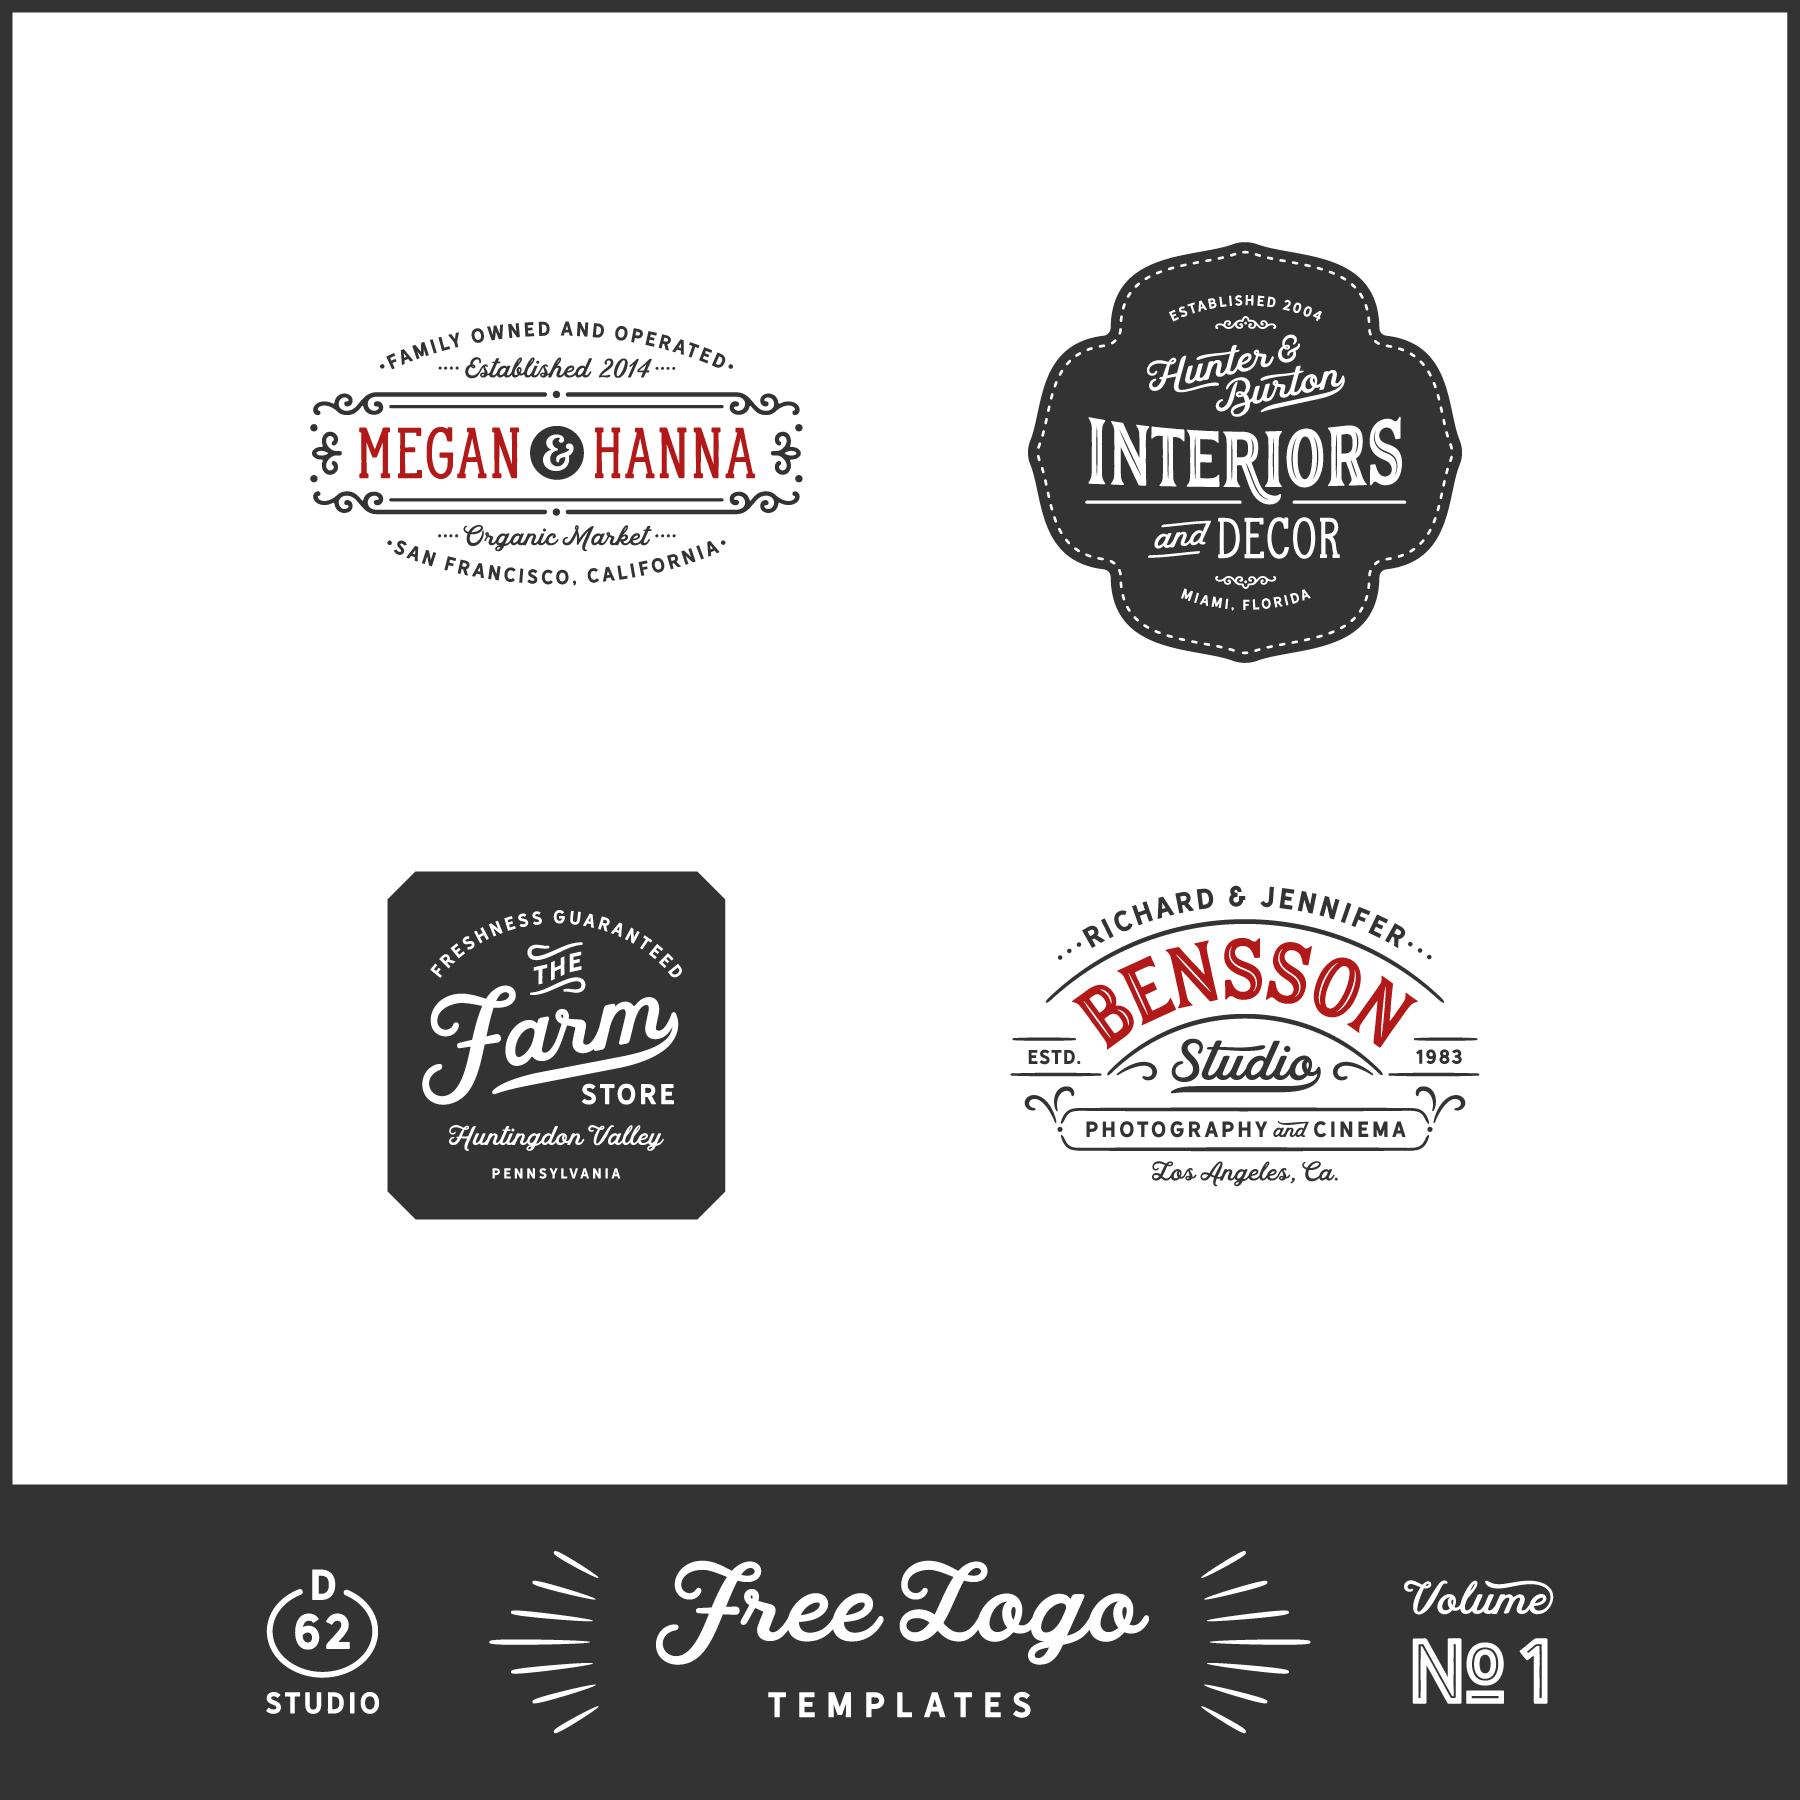 D62 Free logo templates